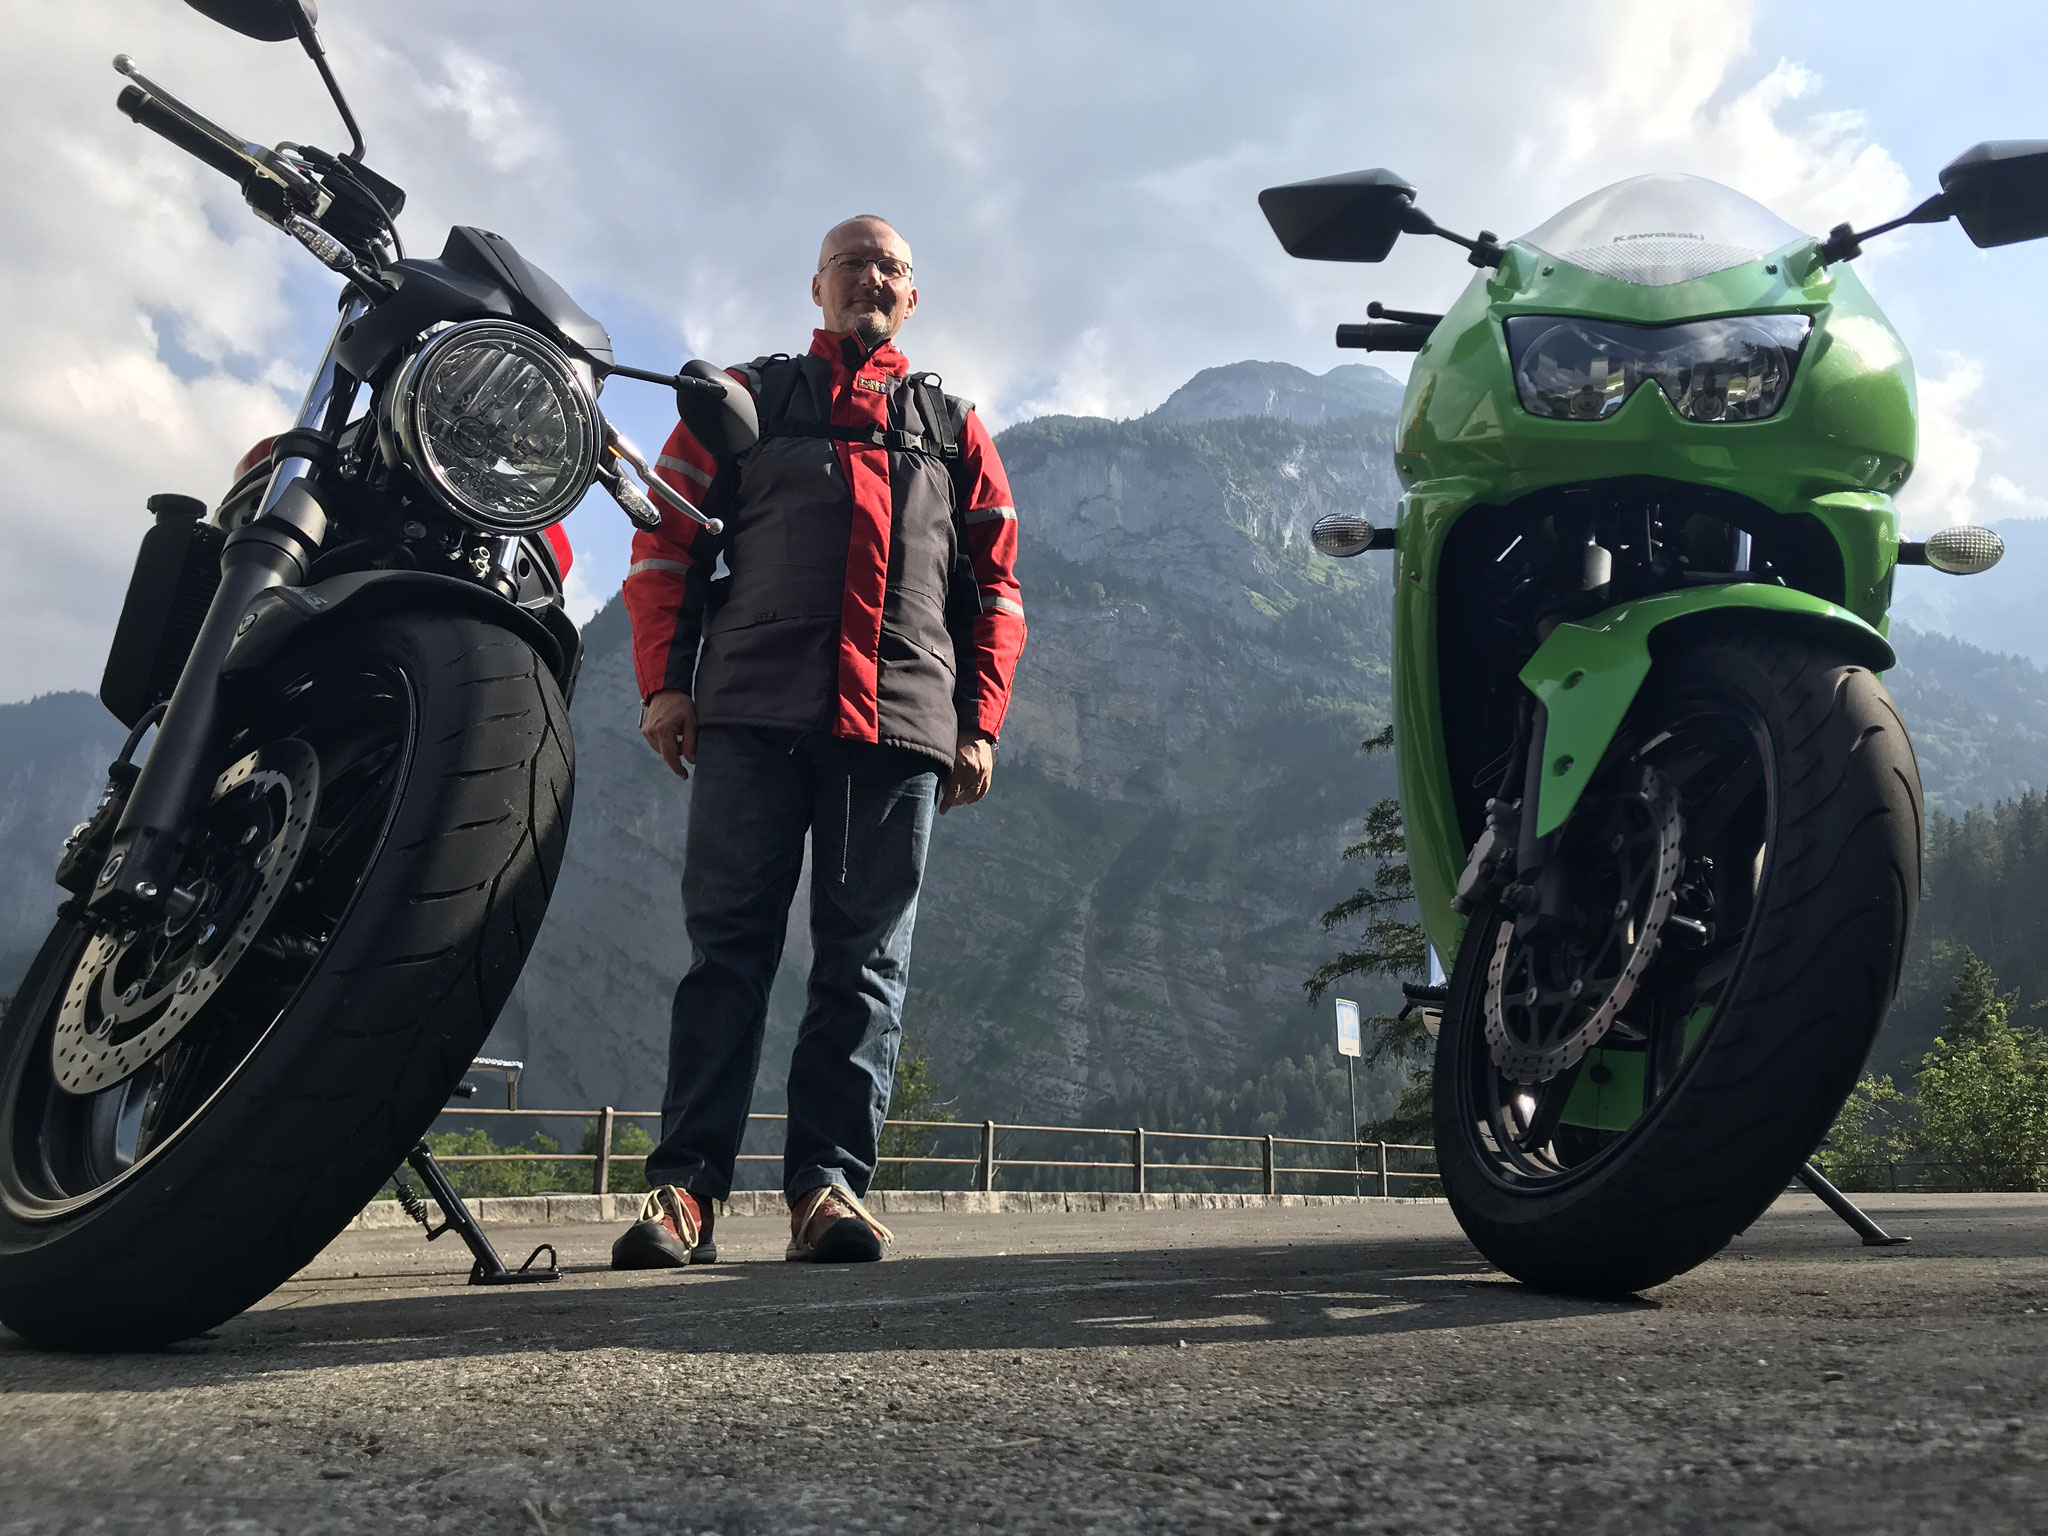 Motorradtour in der Schweiz